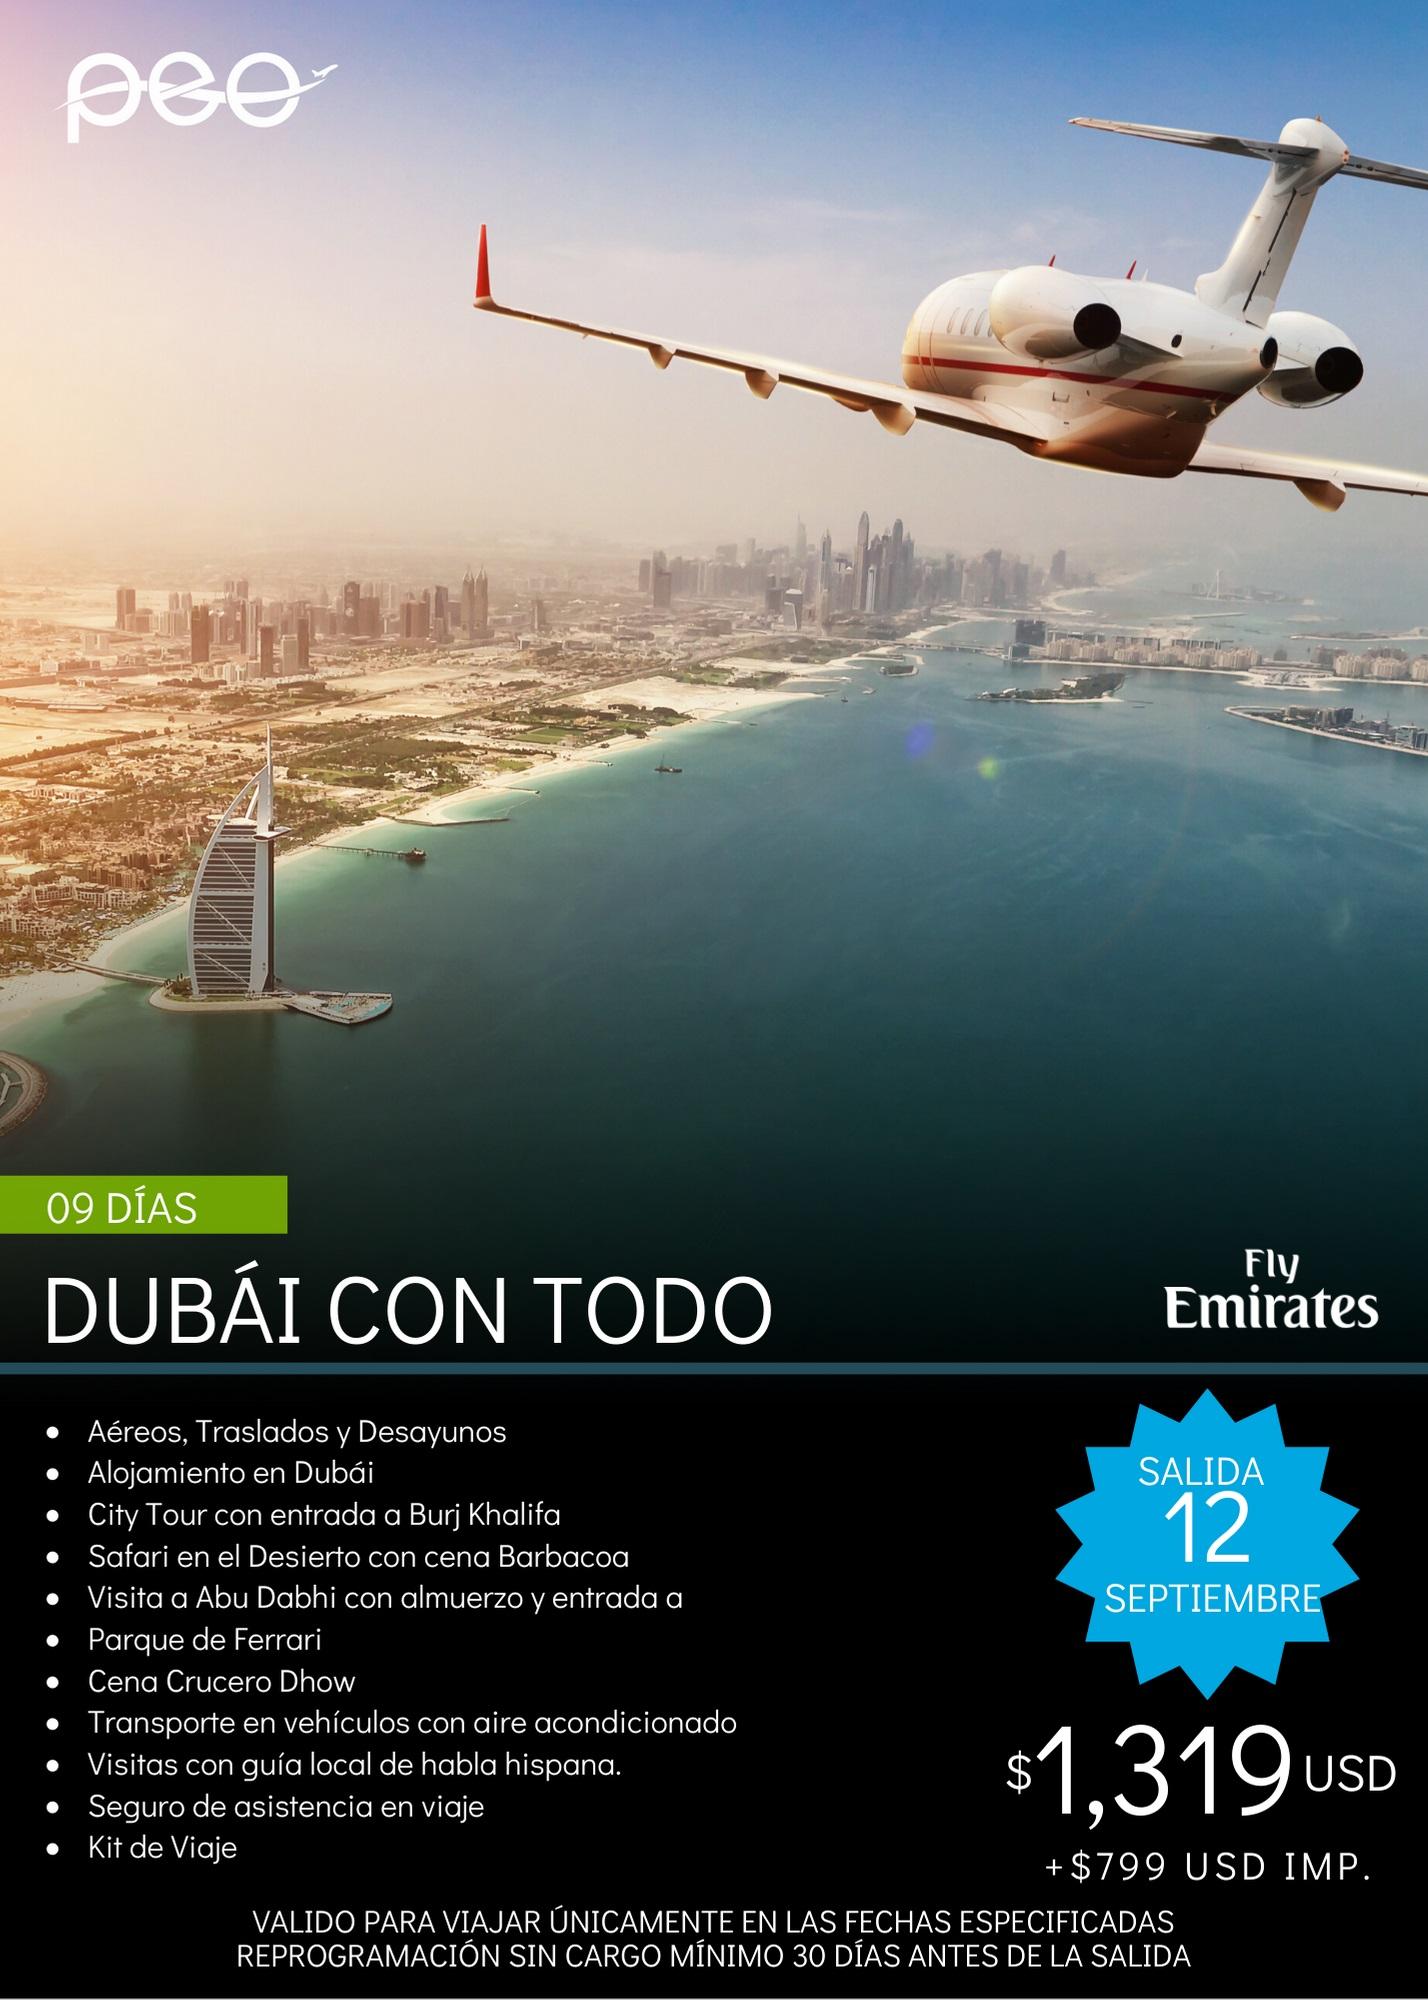 https://0201.nccdn.net/1_2/000/000/121/f72/Dubai-12sept.jpg